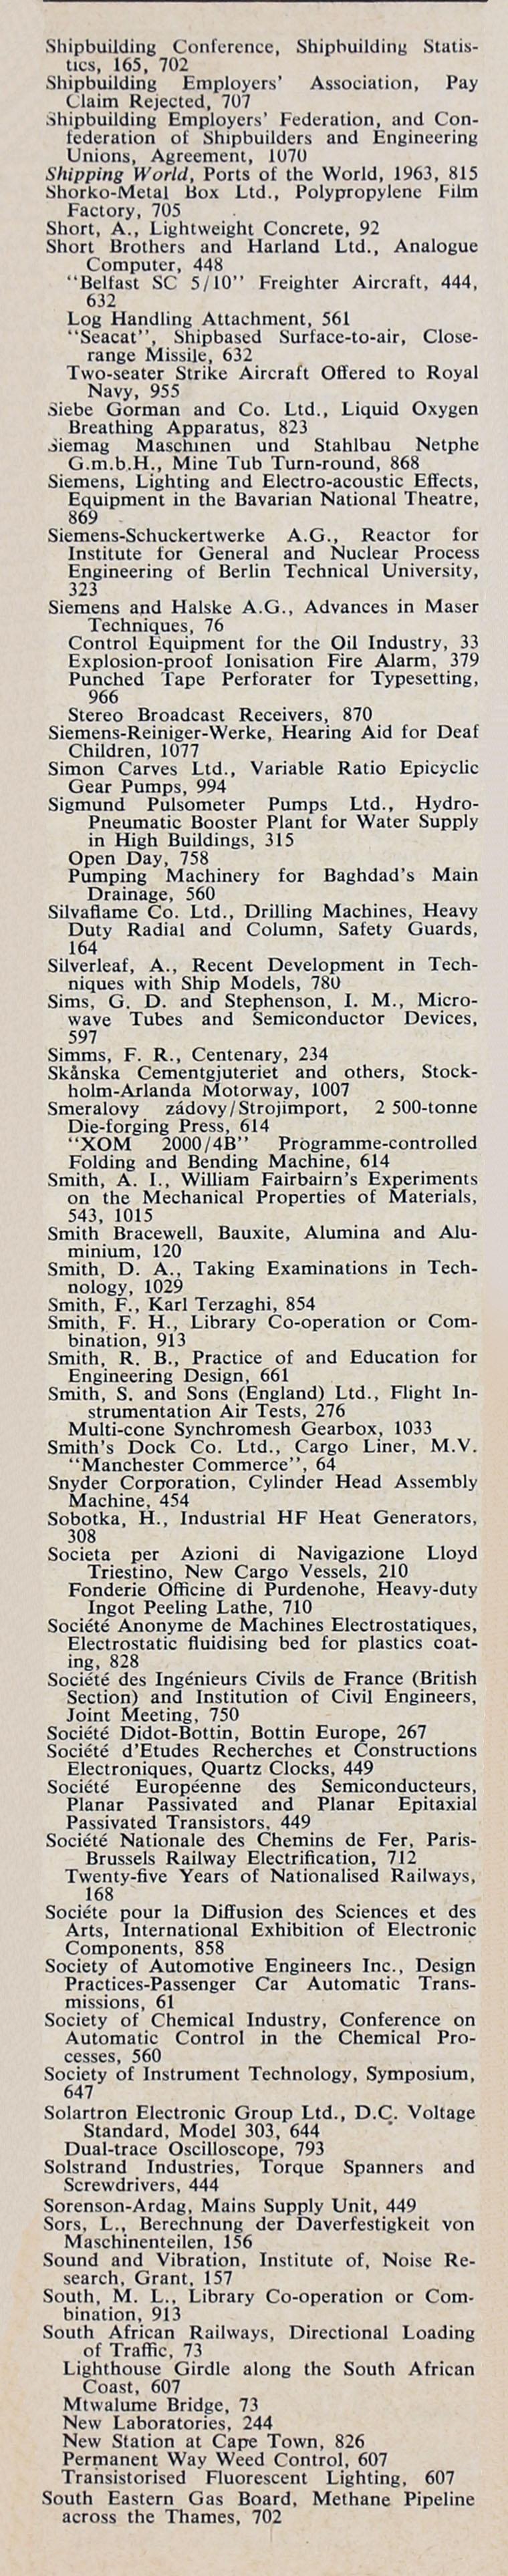 The Engineer 1963 Jul Dec Index # Modele Des Tables Pour Television Plasma En Fer Forge